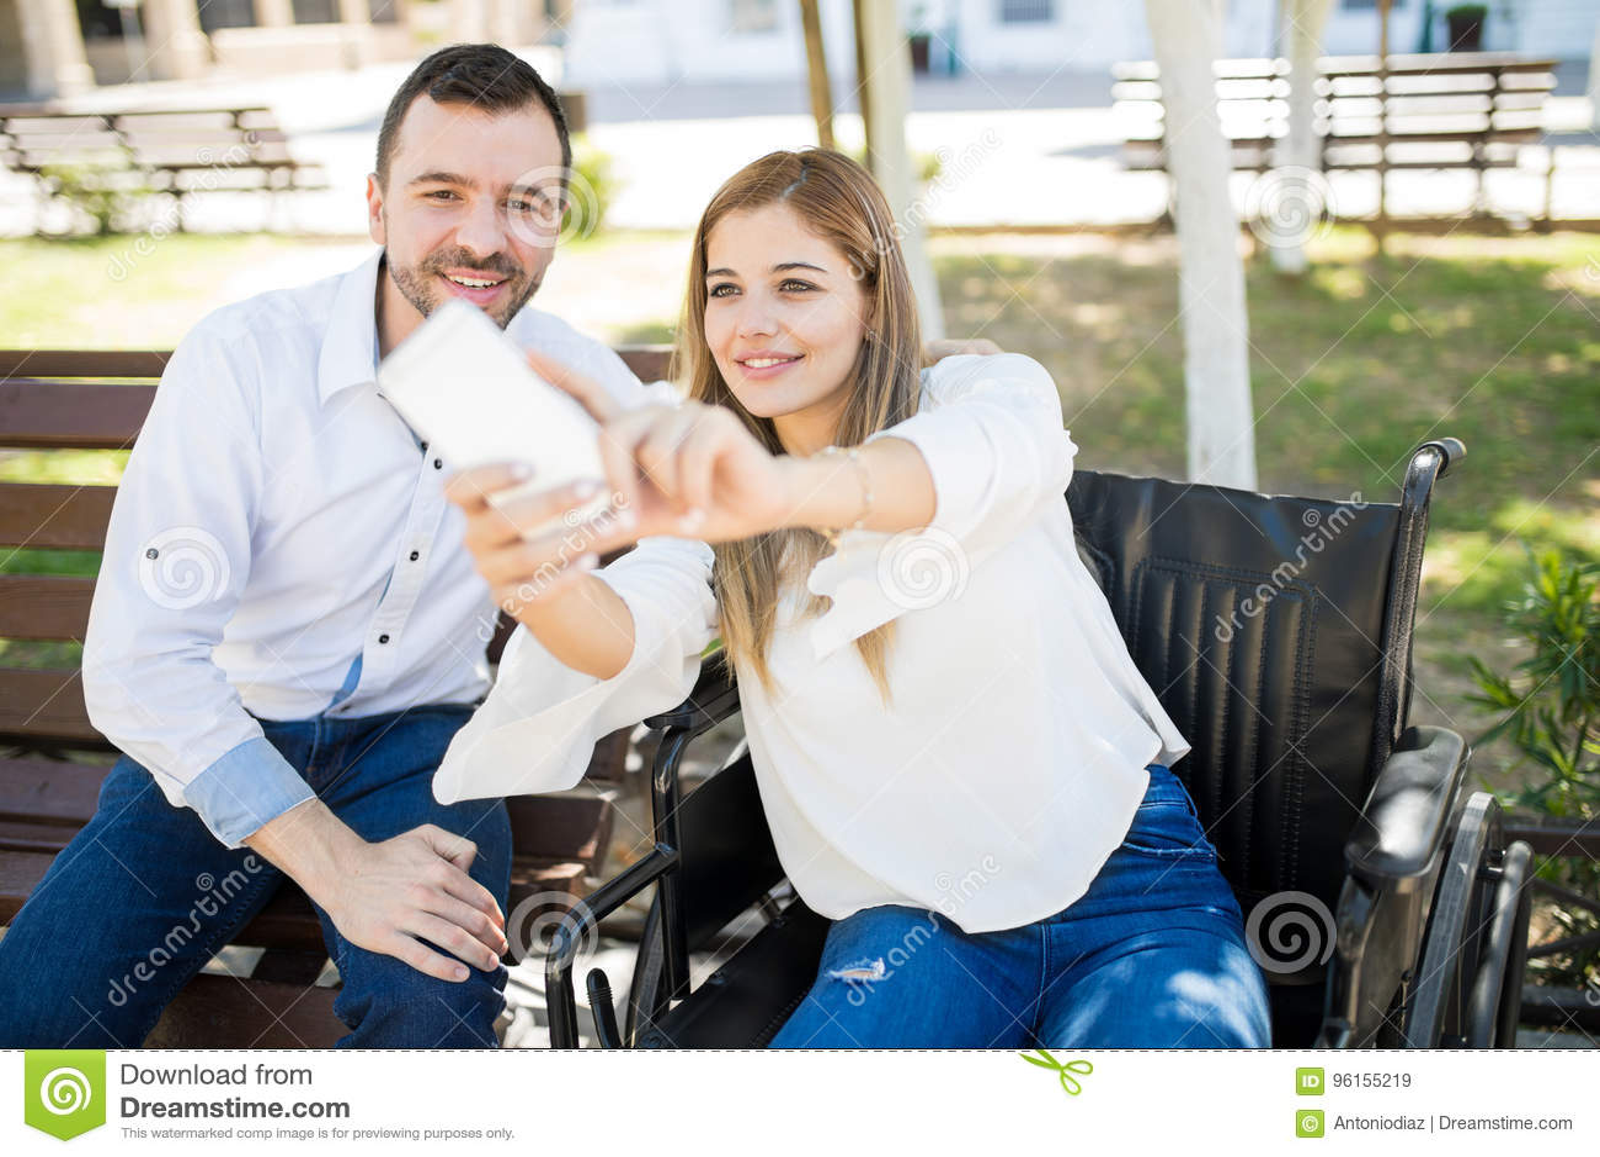 japanese dating sim free online